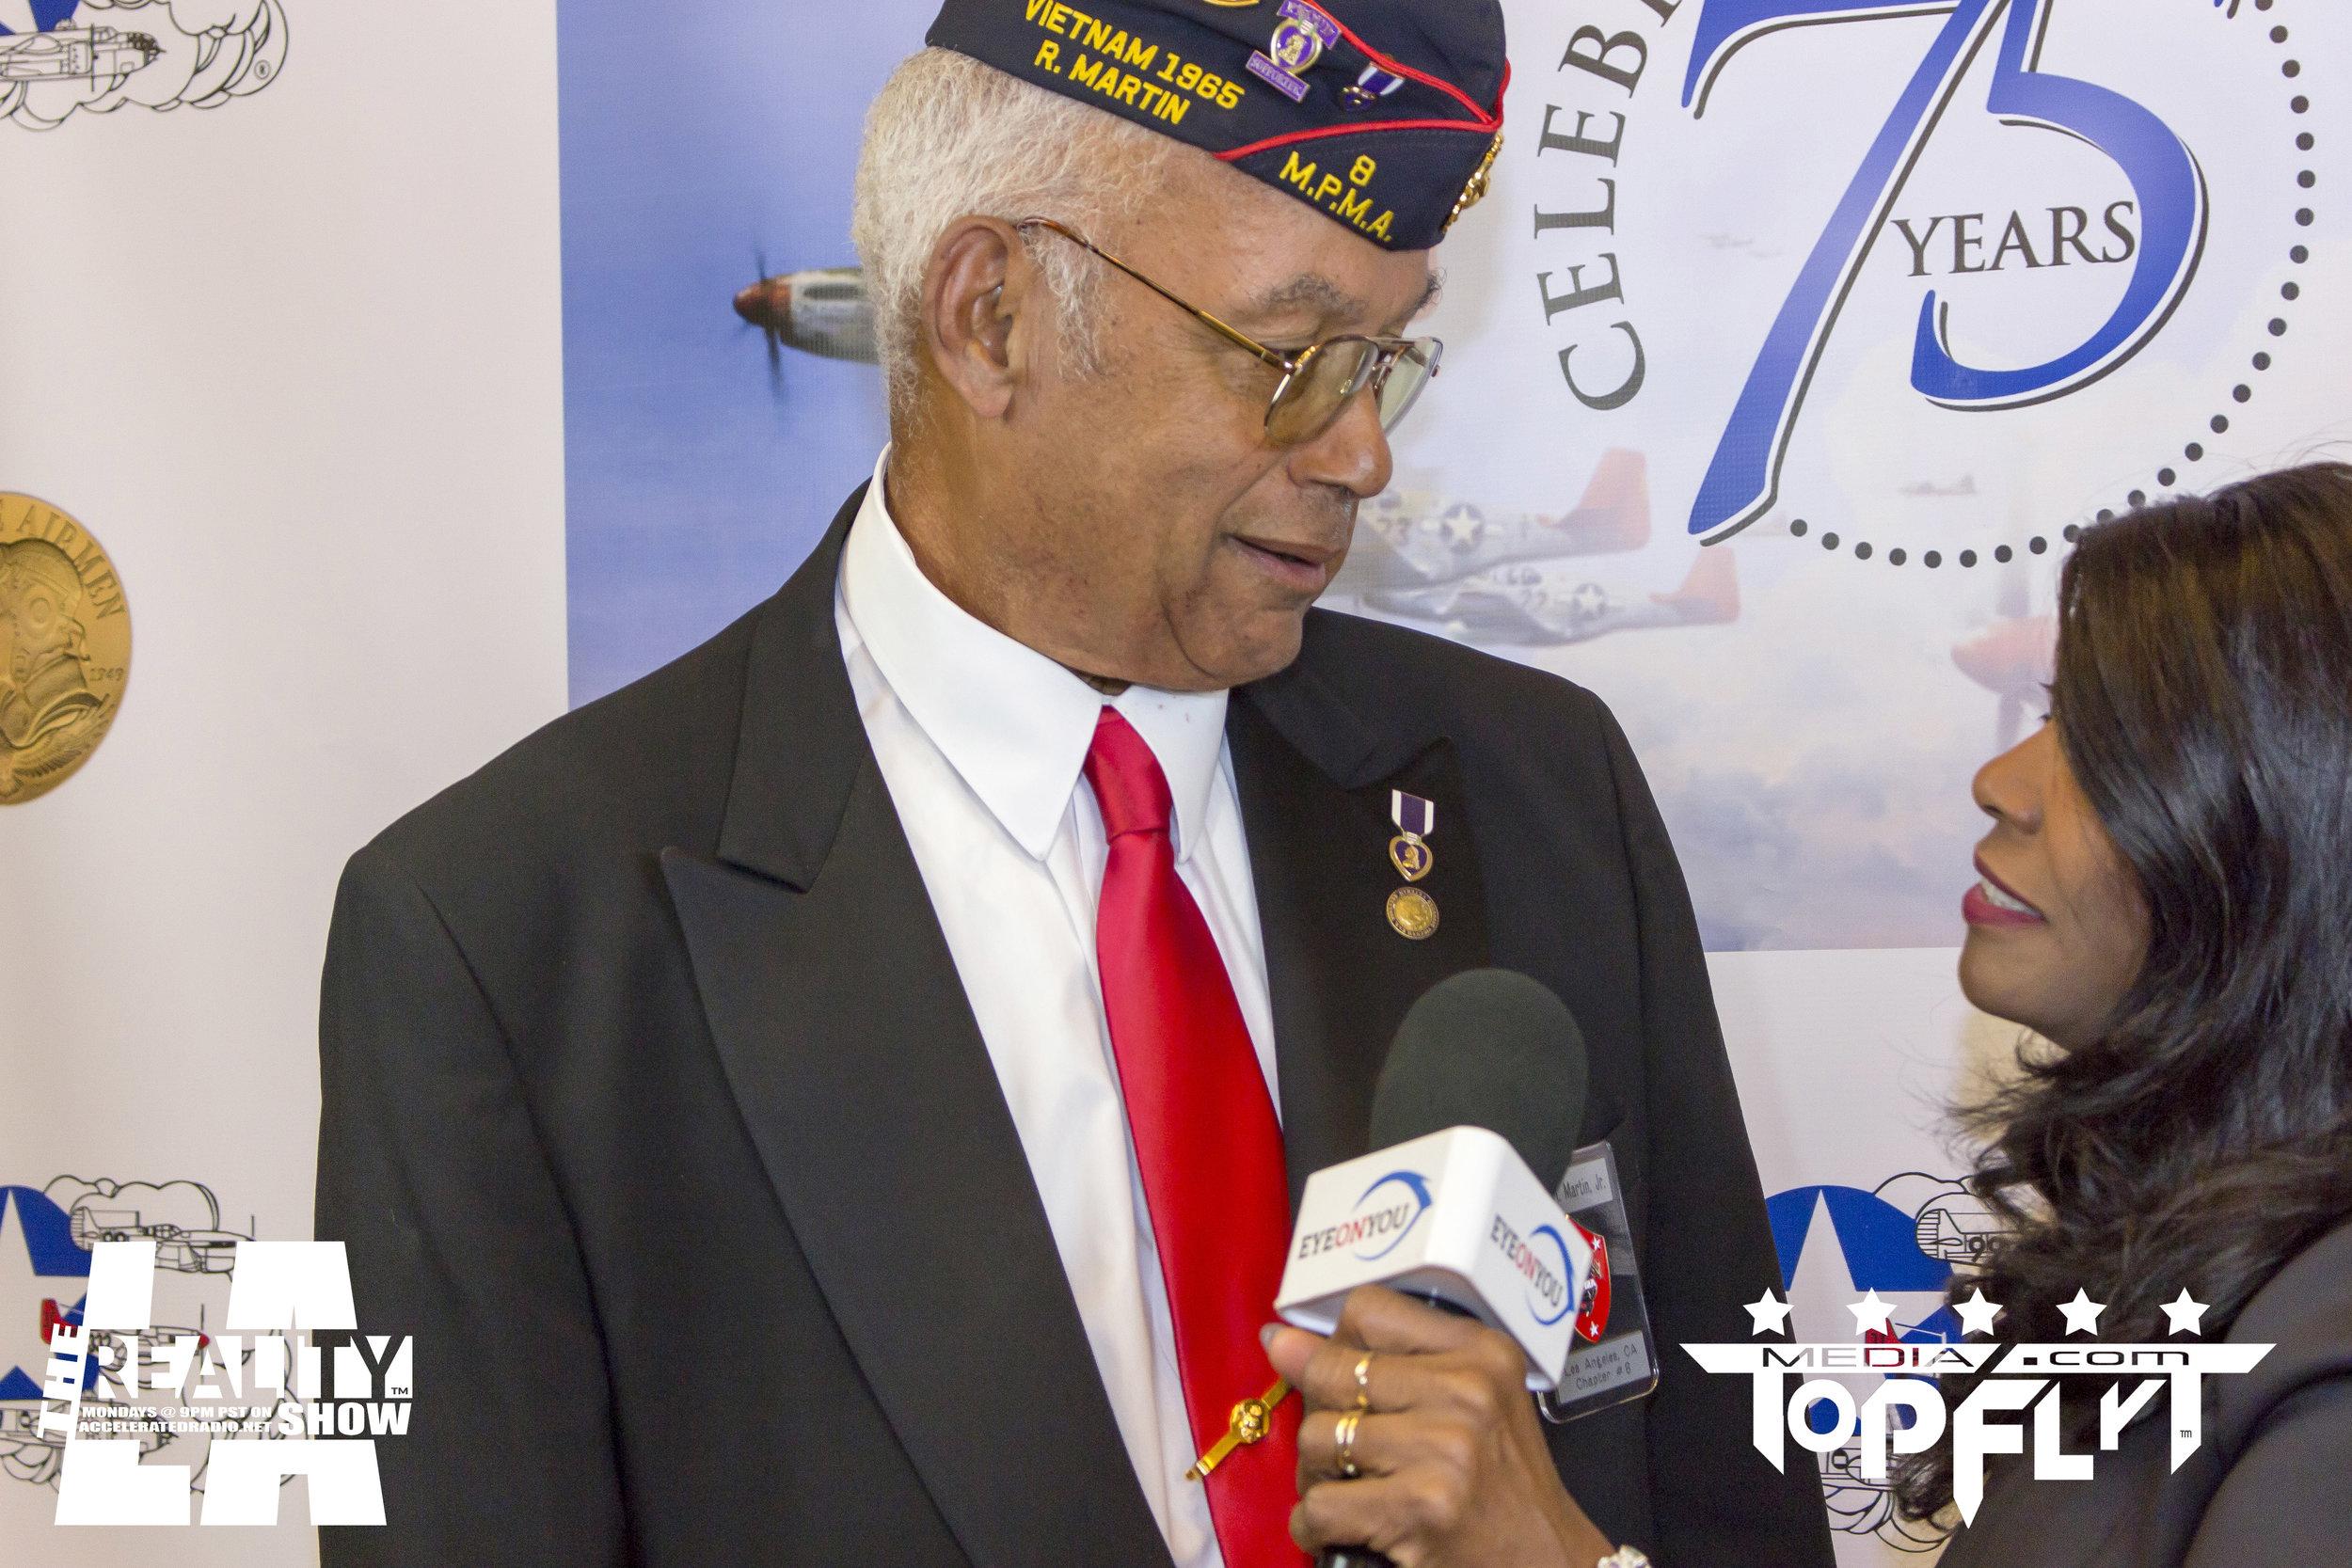 The Reality Show LA - Tuskegee Airmen 75th Anniversary VIP Reception_61.jpg